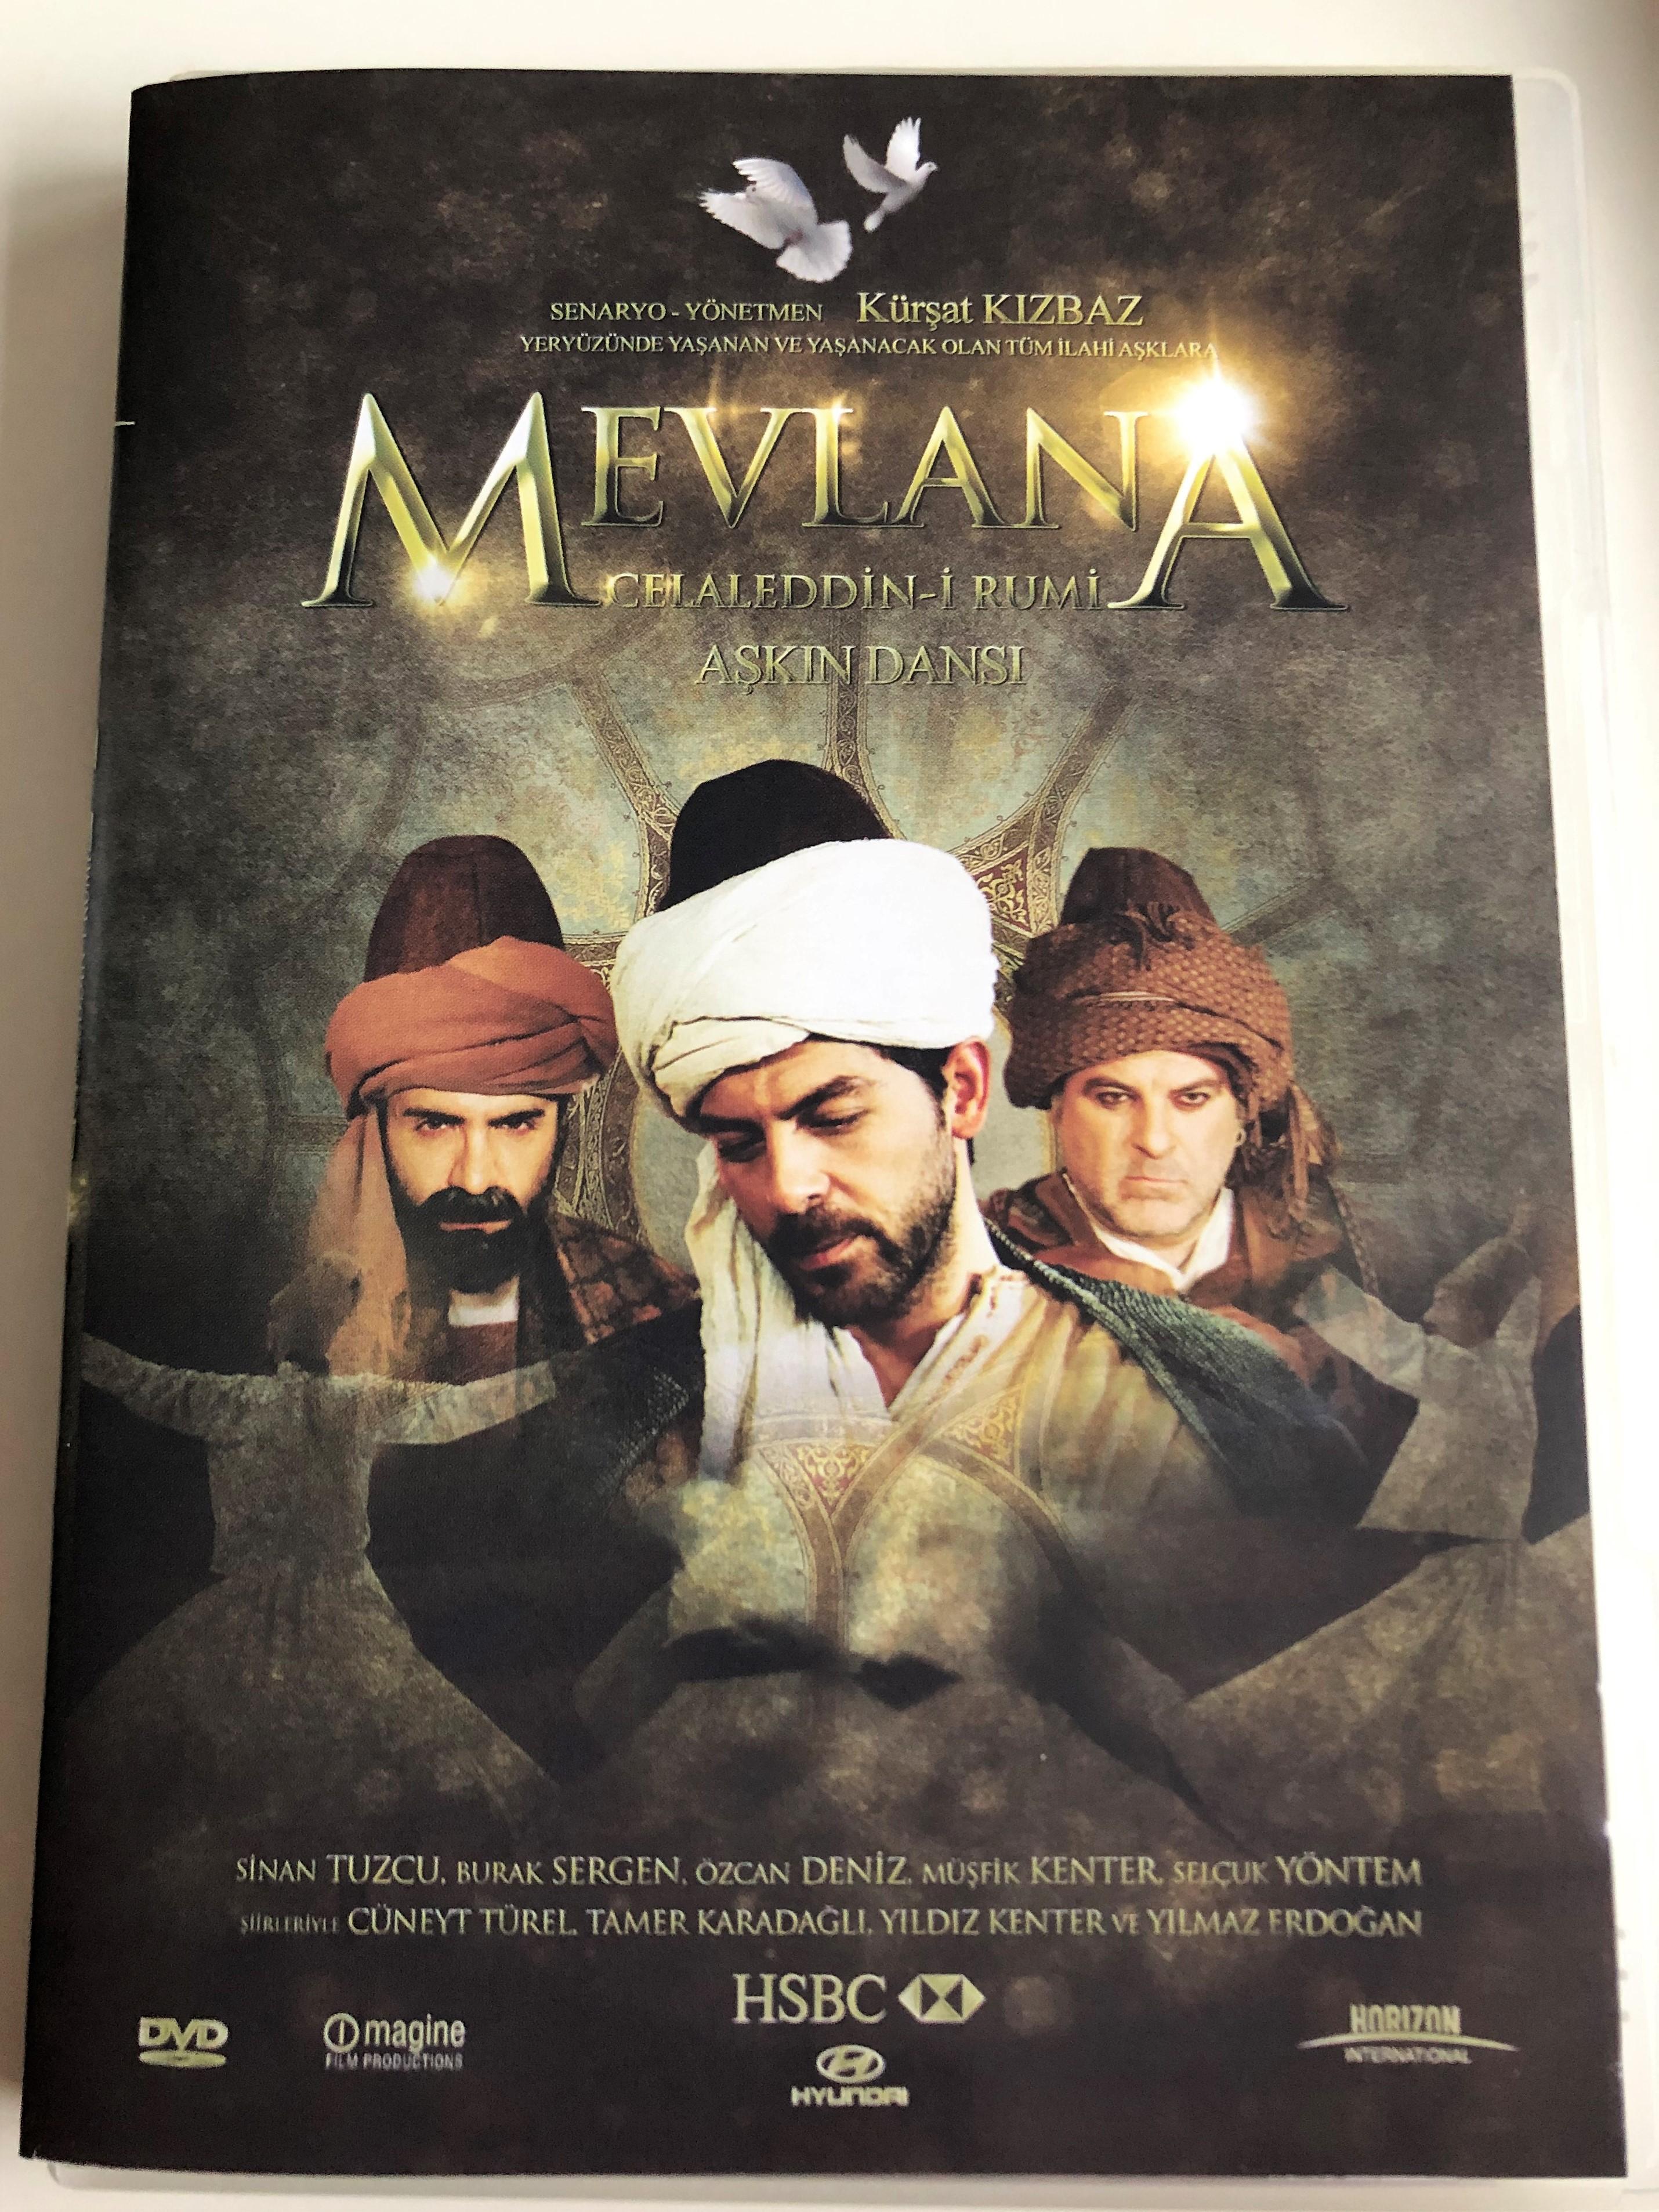 mevlana-celaleddin-i-rumi-a-k-n-dans-dvd-2008-rumi-dance-of-love-directed-by-k-r-at-kizbaz-starring-sinan-tuzcu-burak-sergen-zcan-deniz-1-.jpg